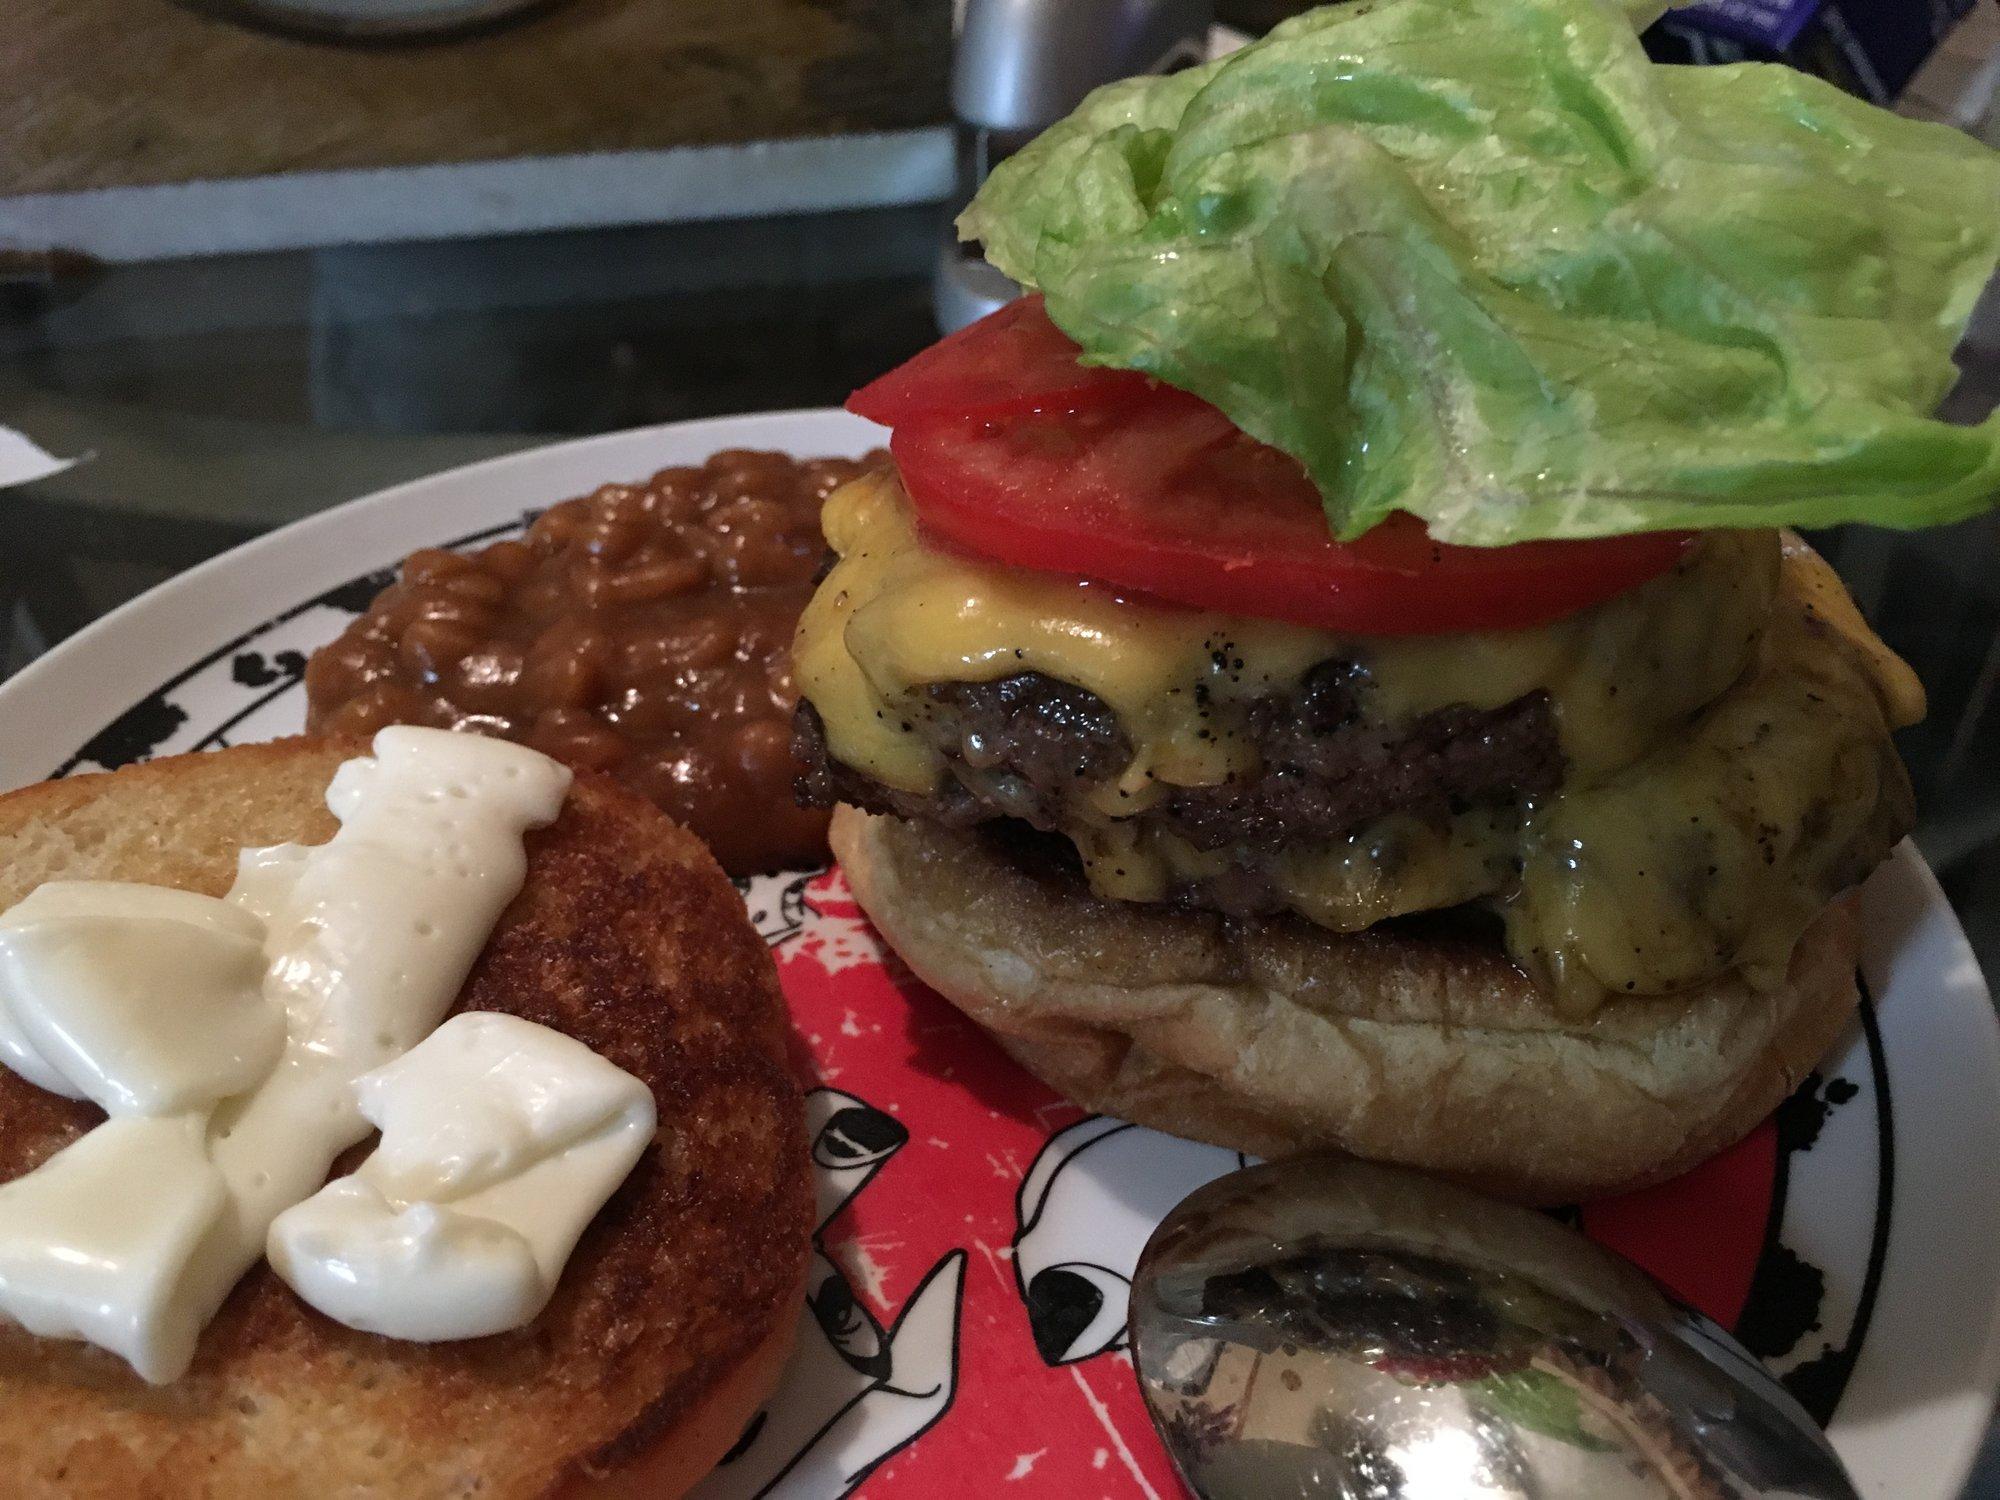 Smash burgers... OMG — Big Green Egg - EGGhead Forum - The ...